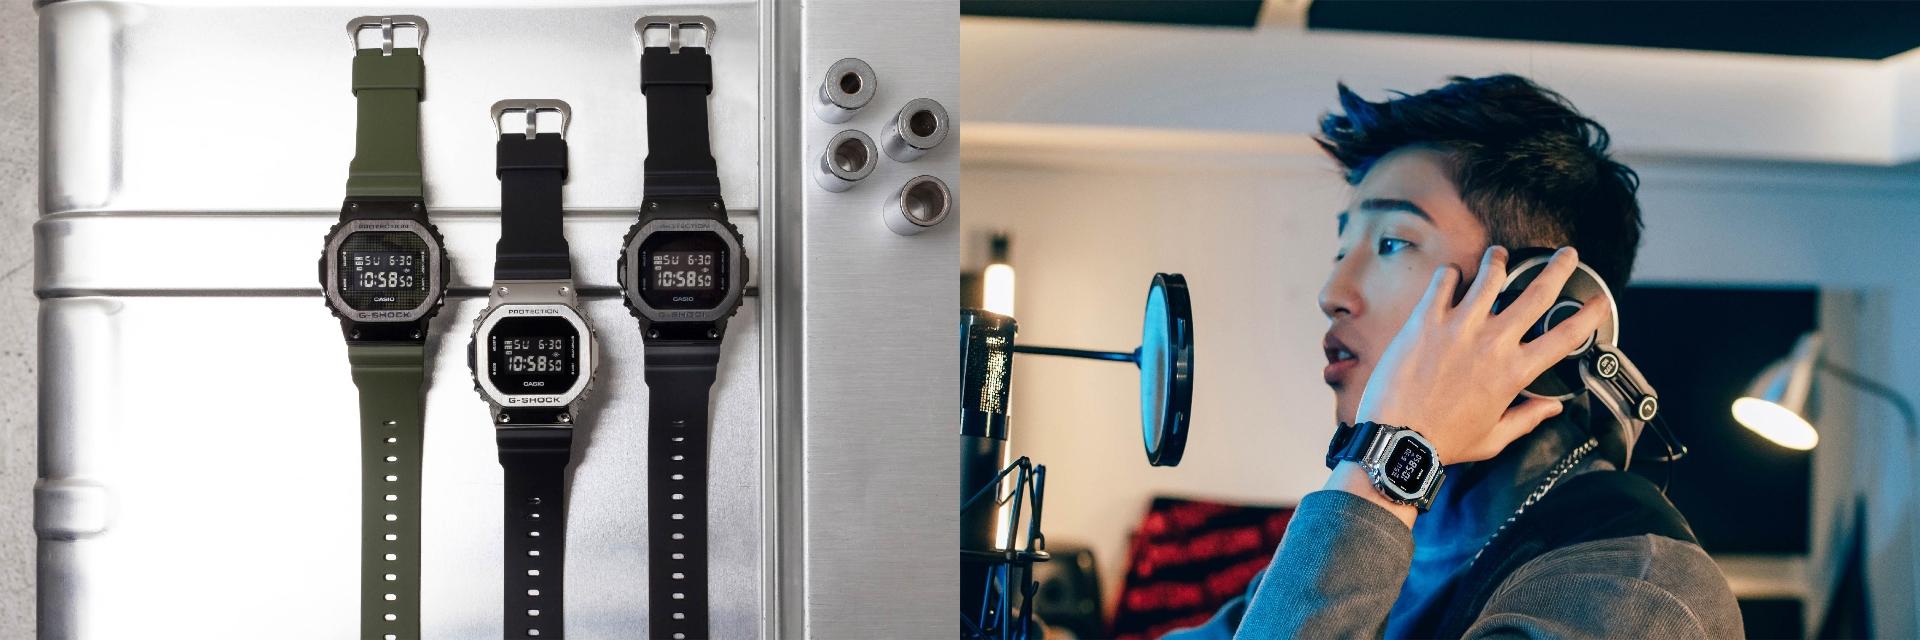 G-SHOCK經典錶款 5600系列再升級,金屬質感讓強悍態度更進擊!這個初戀情人我可以~